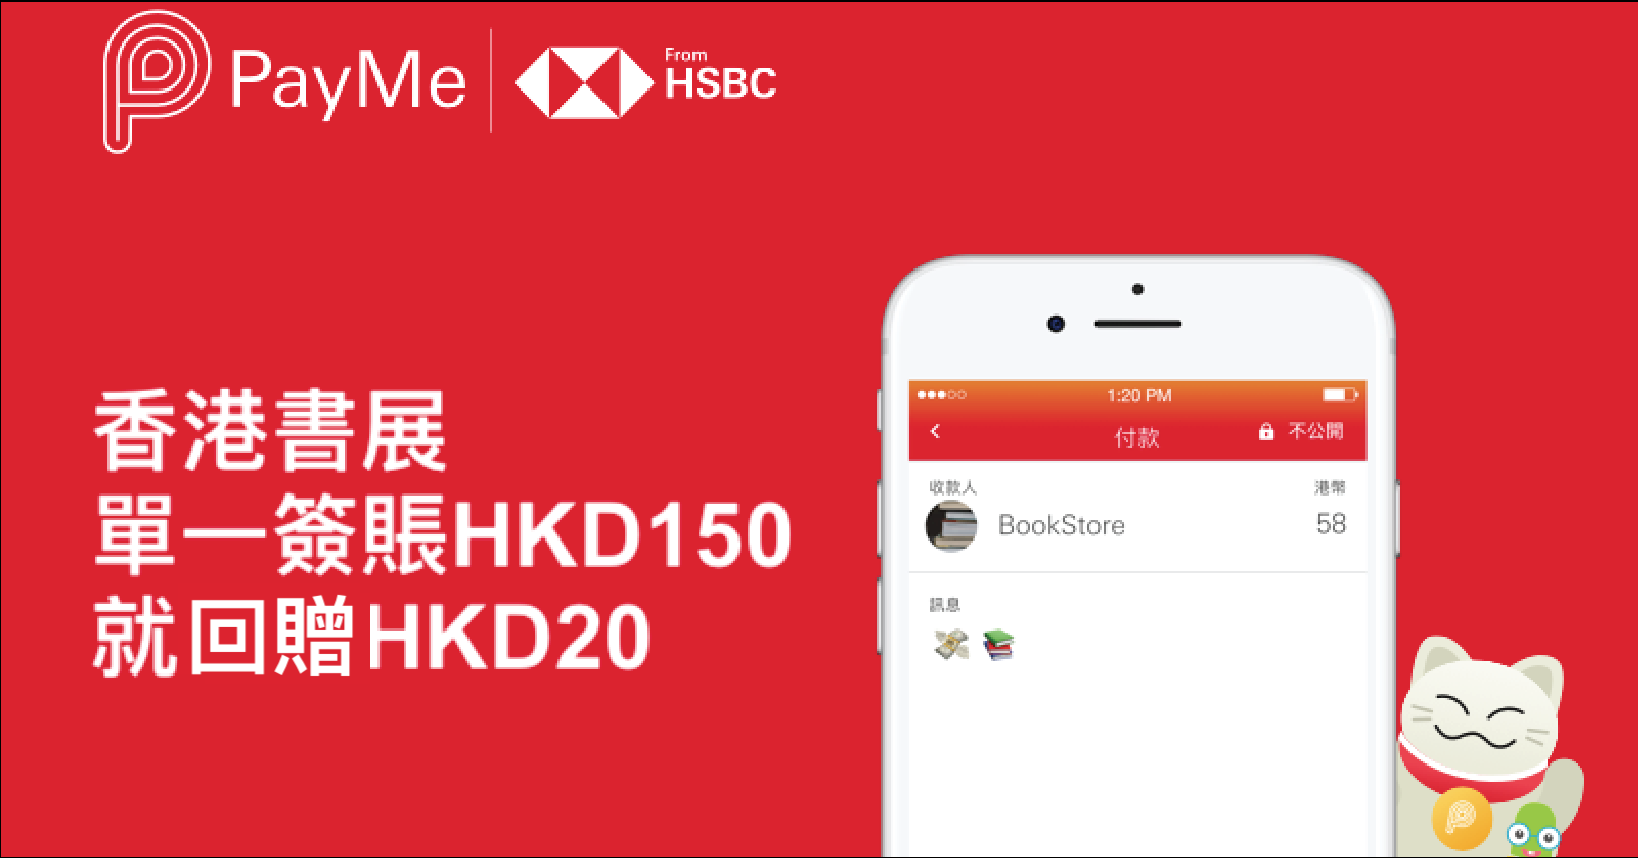 PayMe 優惠!香港書展單一簽賬HKD150就回贈HKD20!每人每日可享5次!